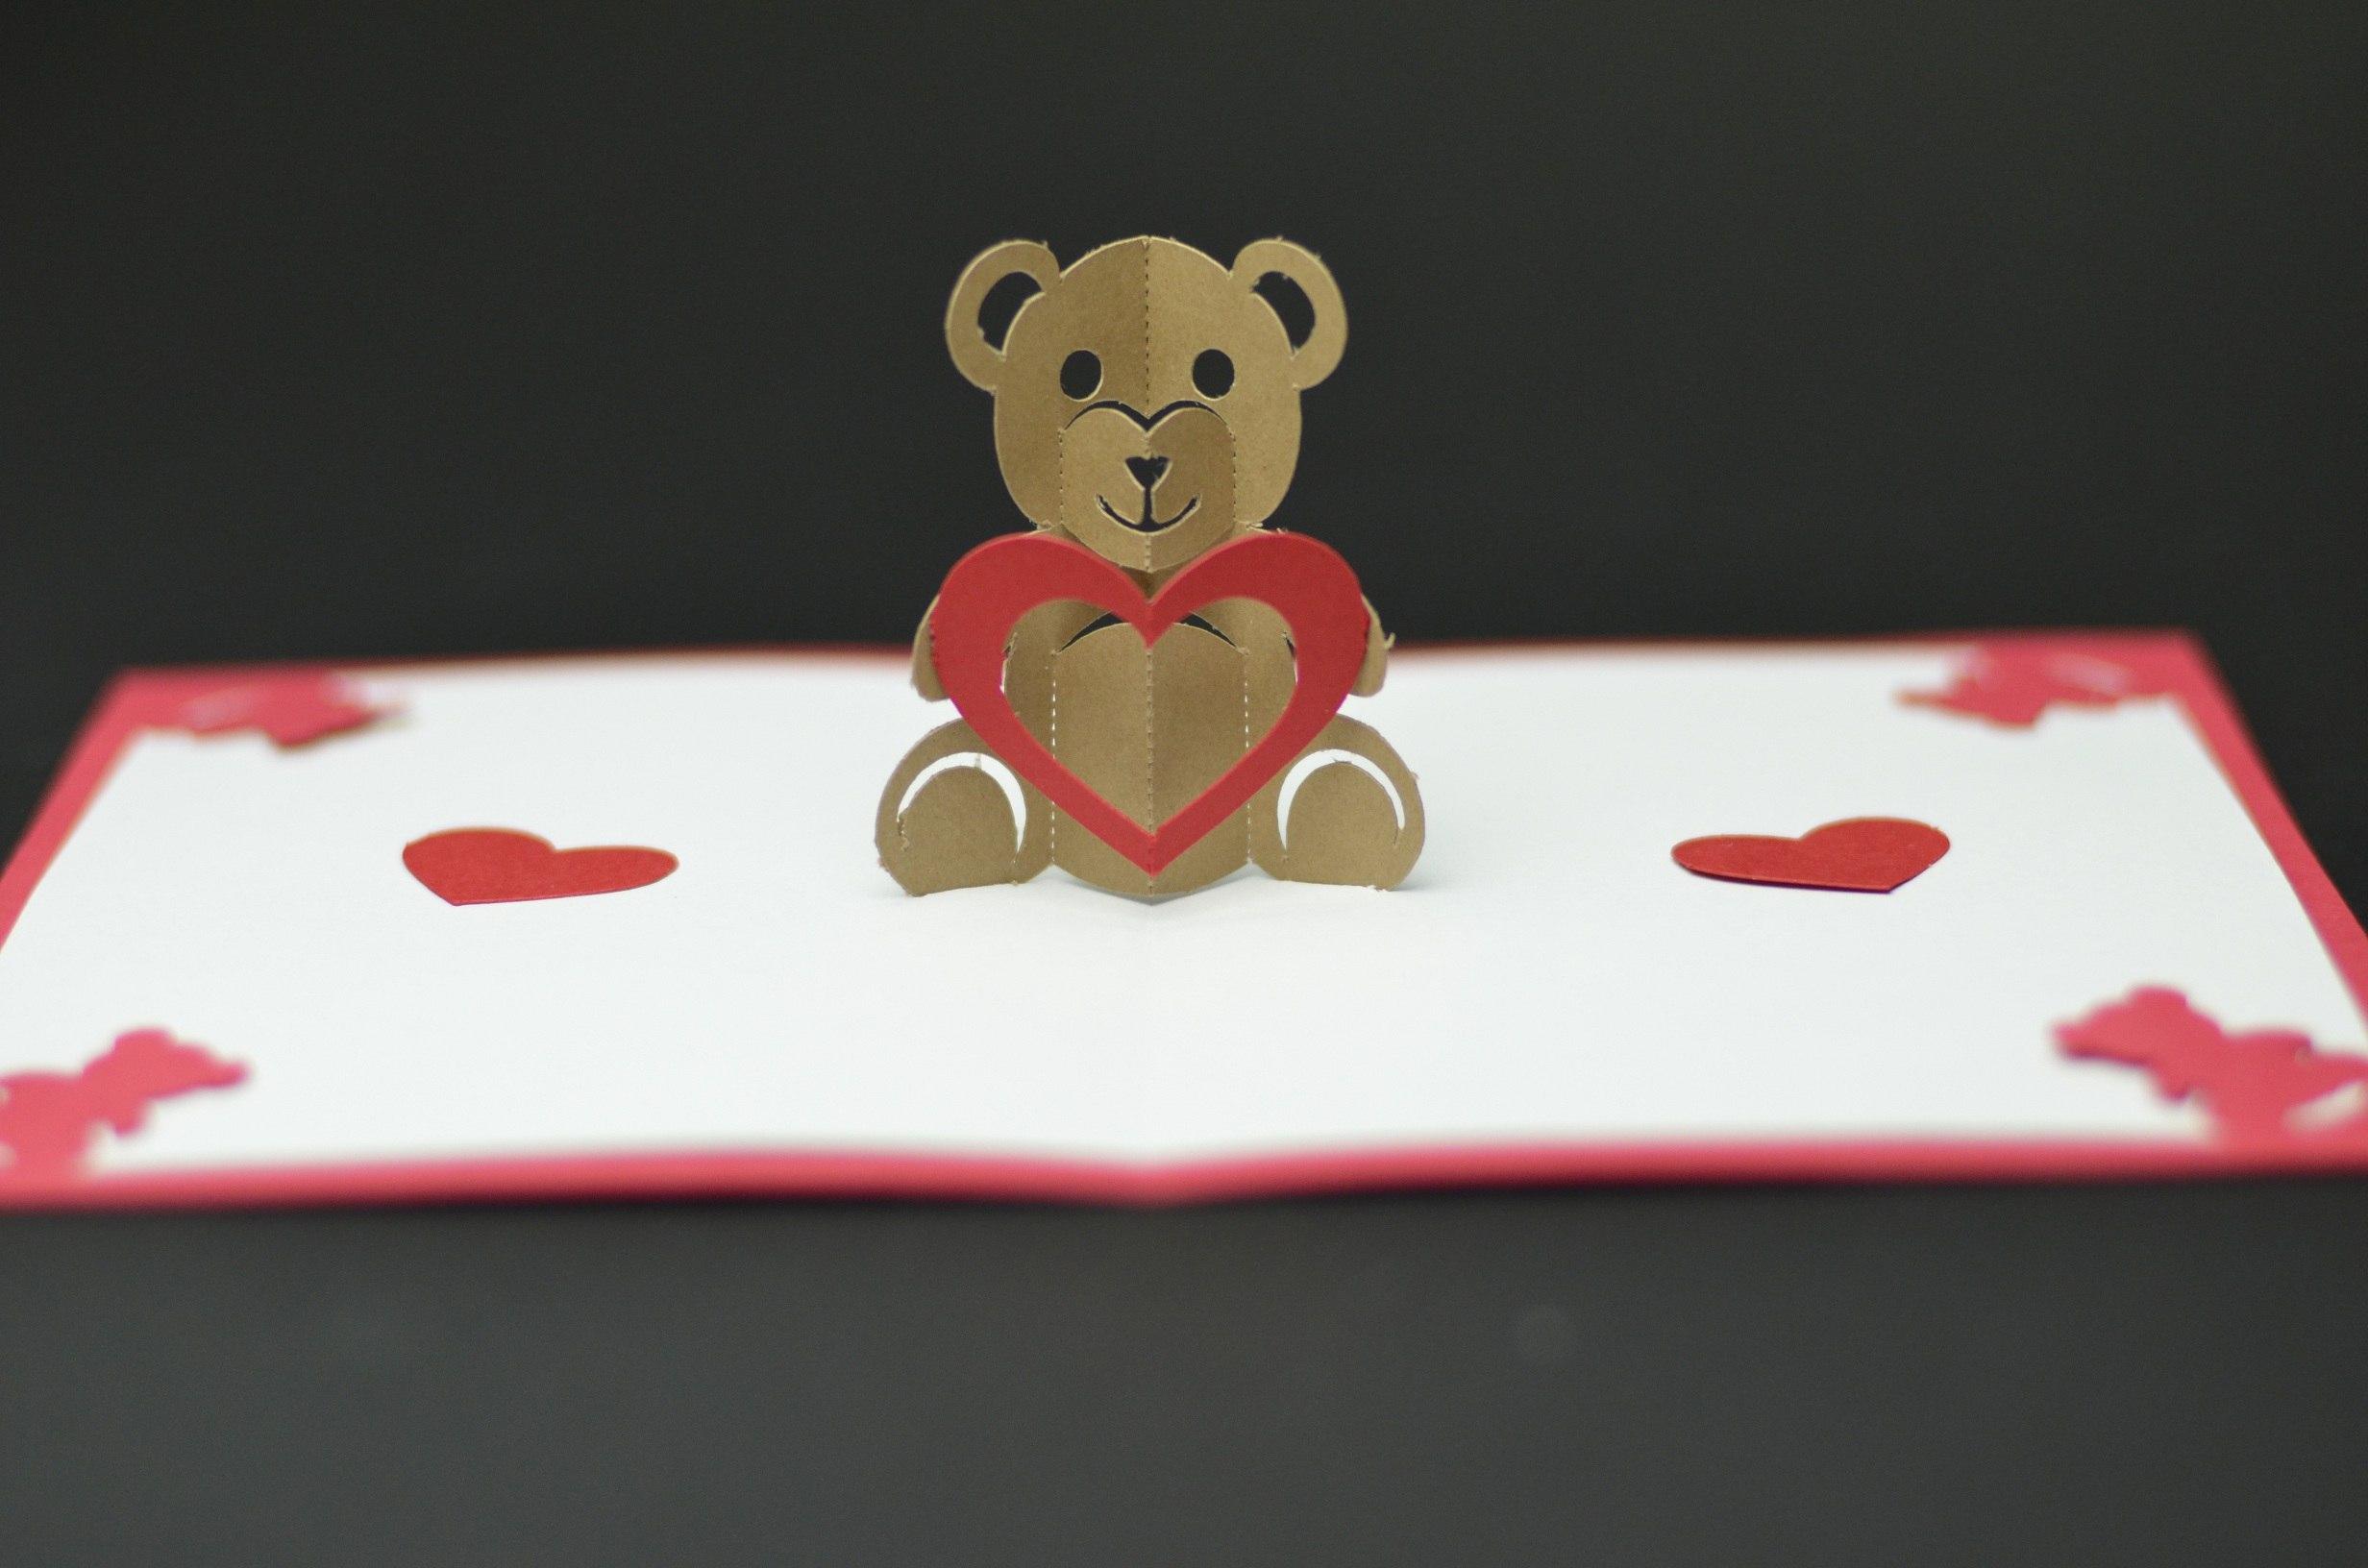 Pop Up Card Tutorials And Templates  Creative Pop Up Cards For Templates For Pop Up Cards Free